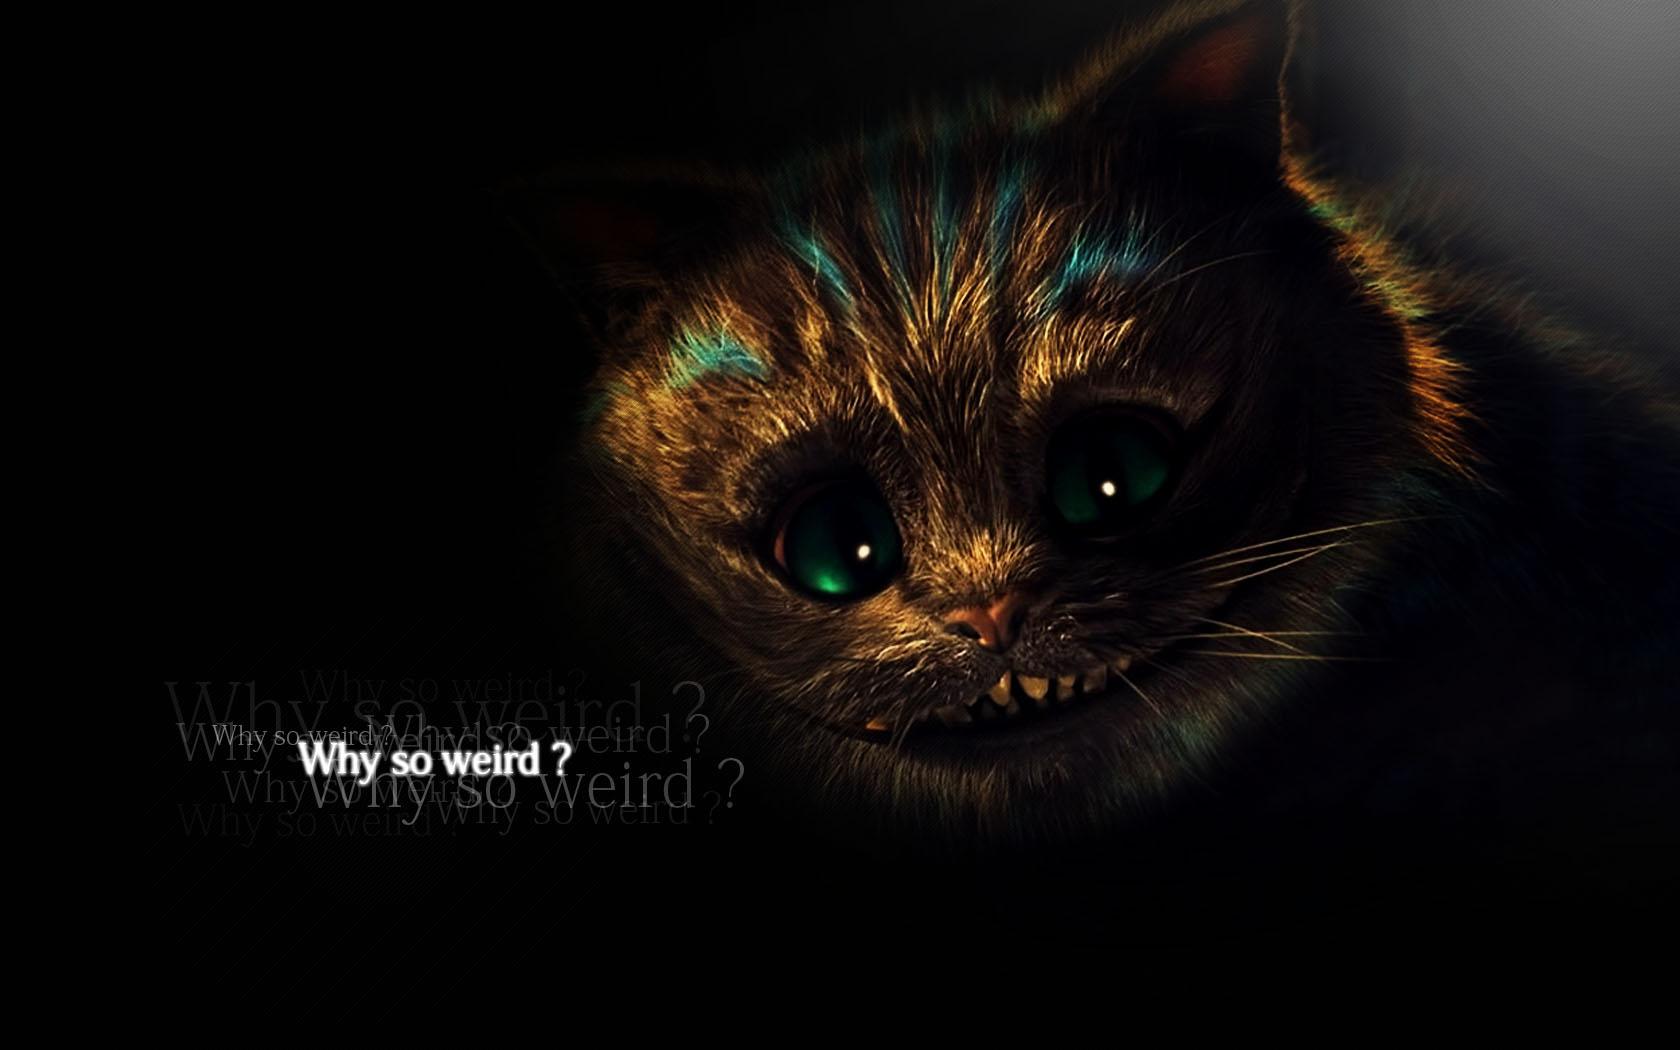 Cheshire Cat Wallpaper Mobile Phone